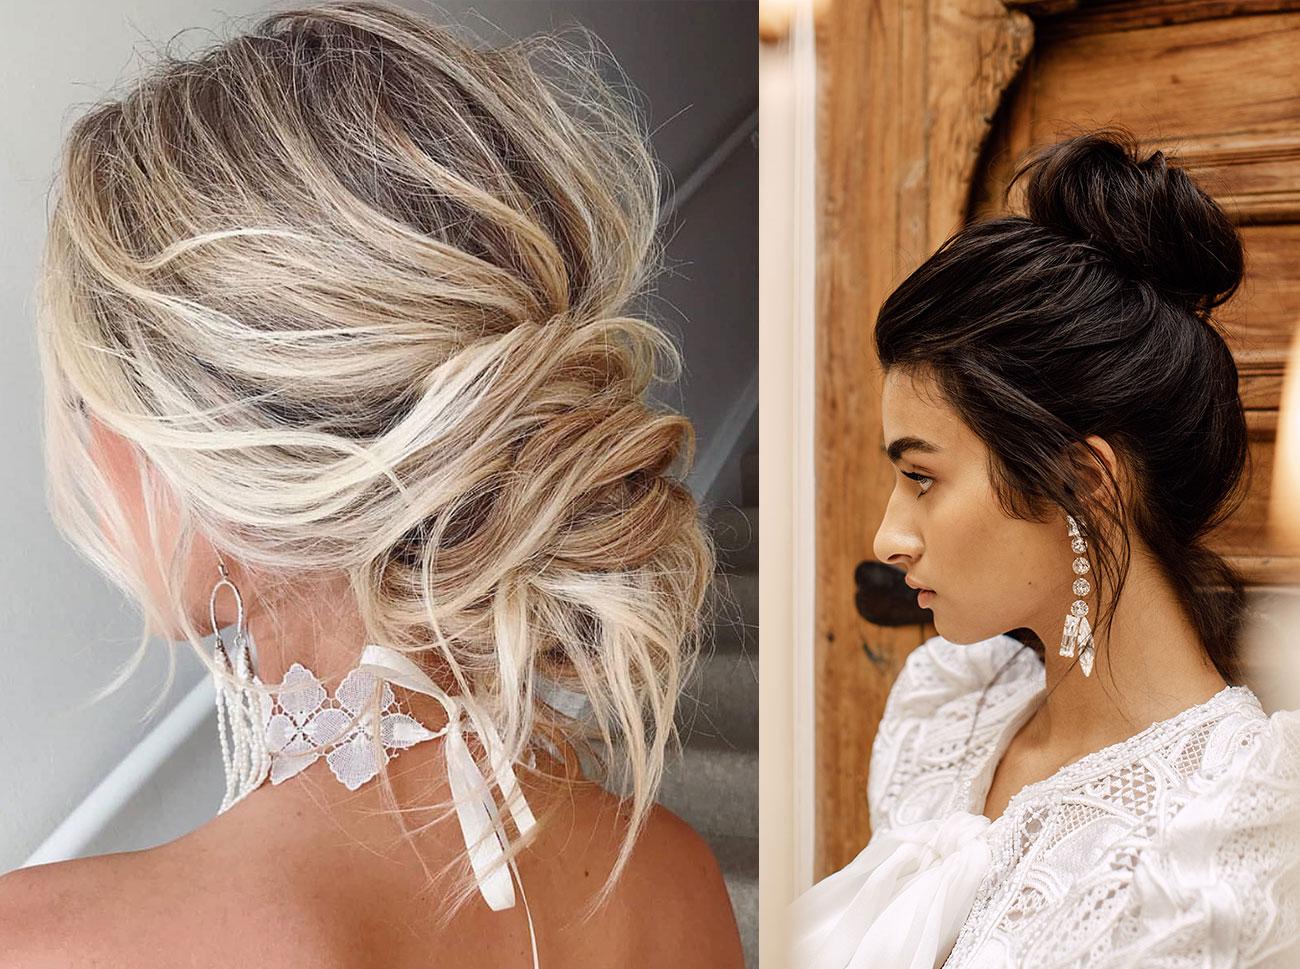 Trending Now: Boho-Chic Messy Bun Wedding Hairstyles